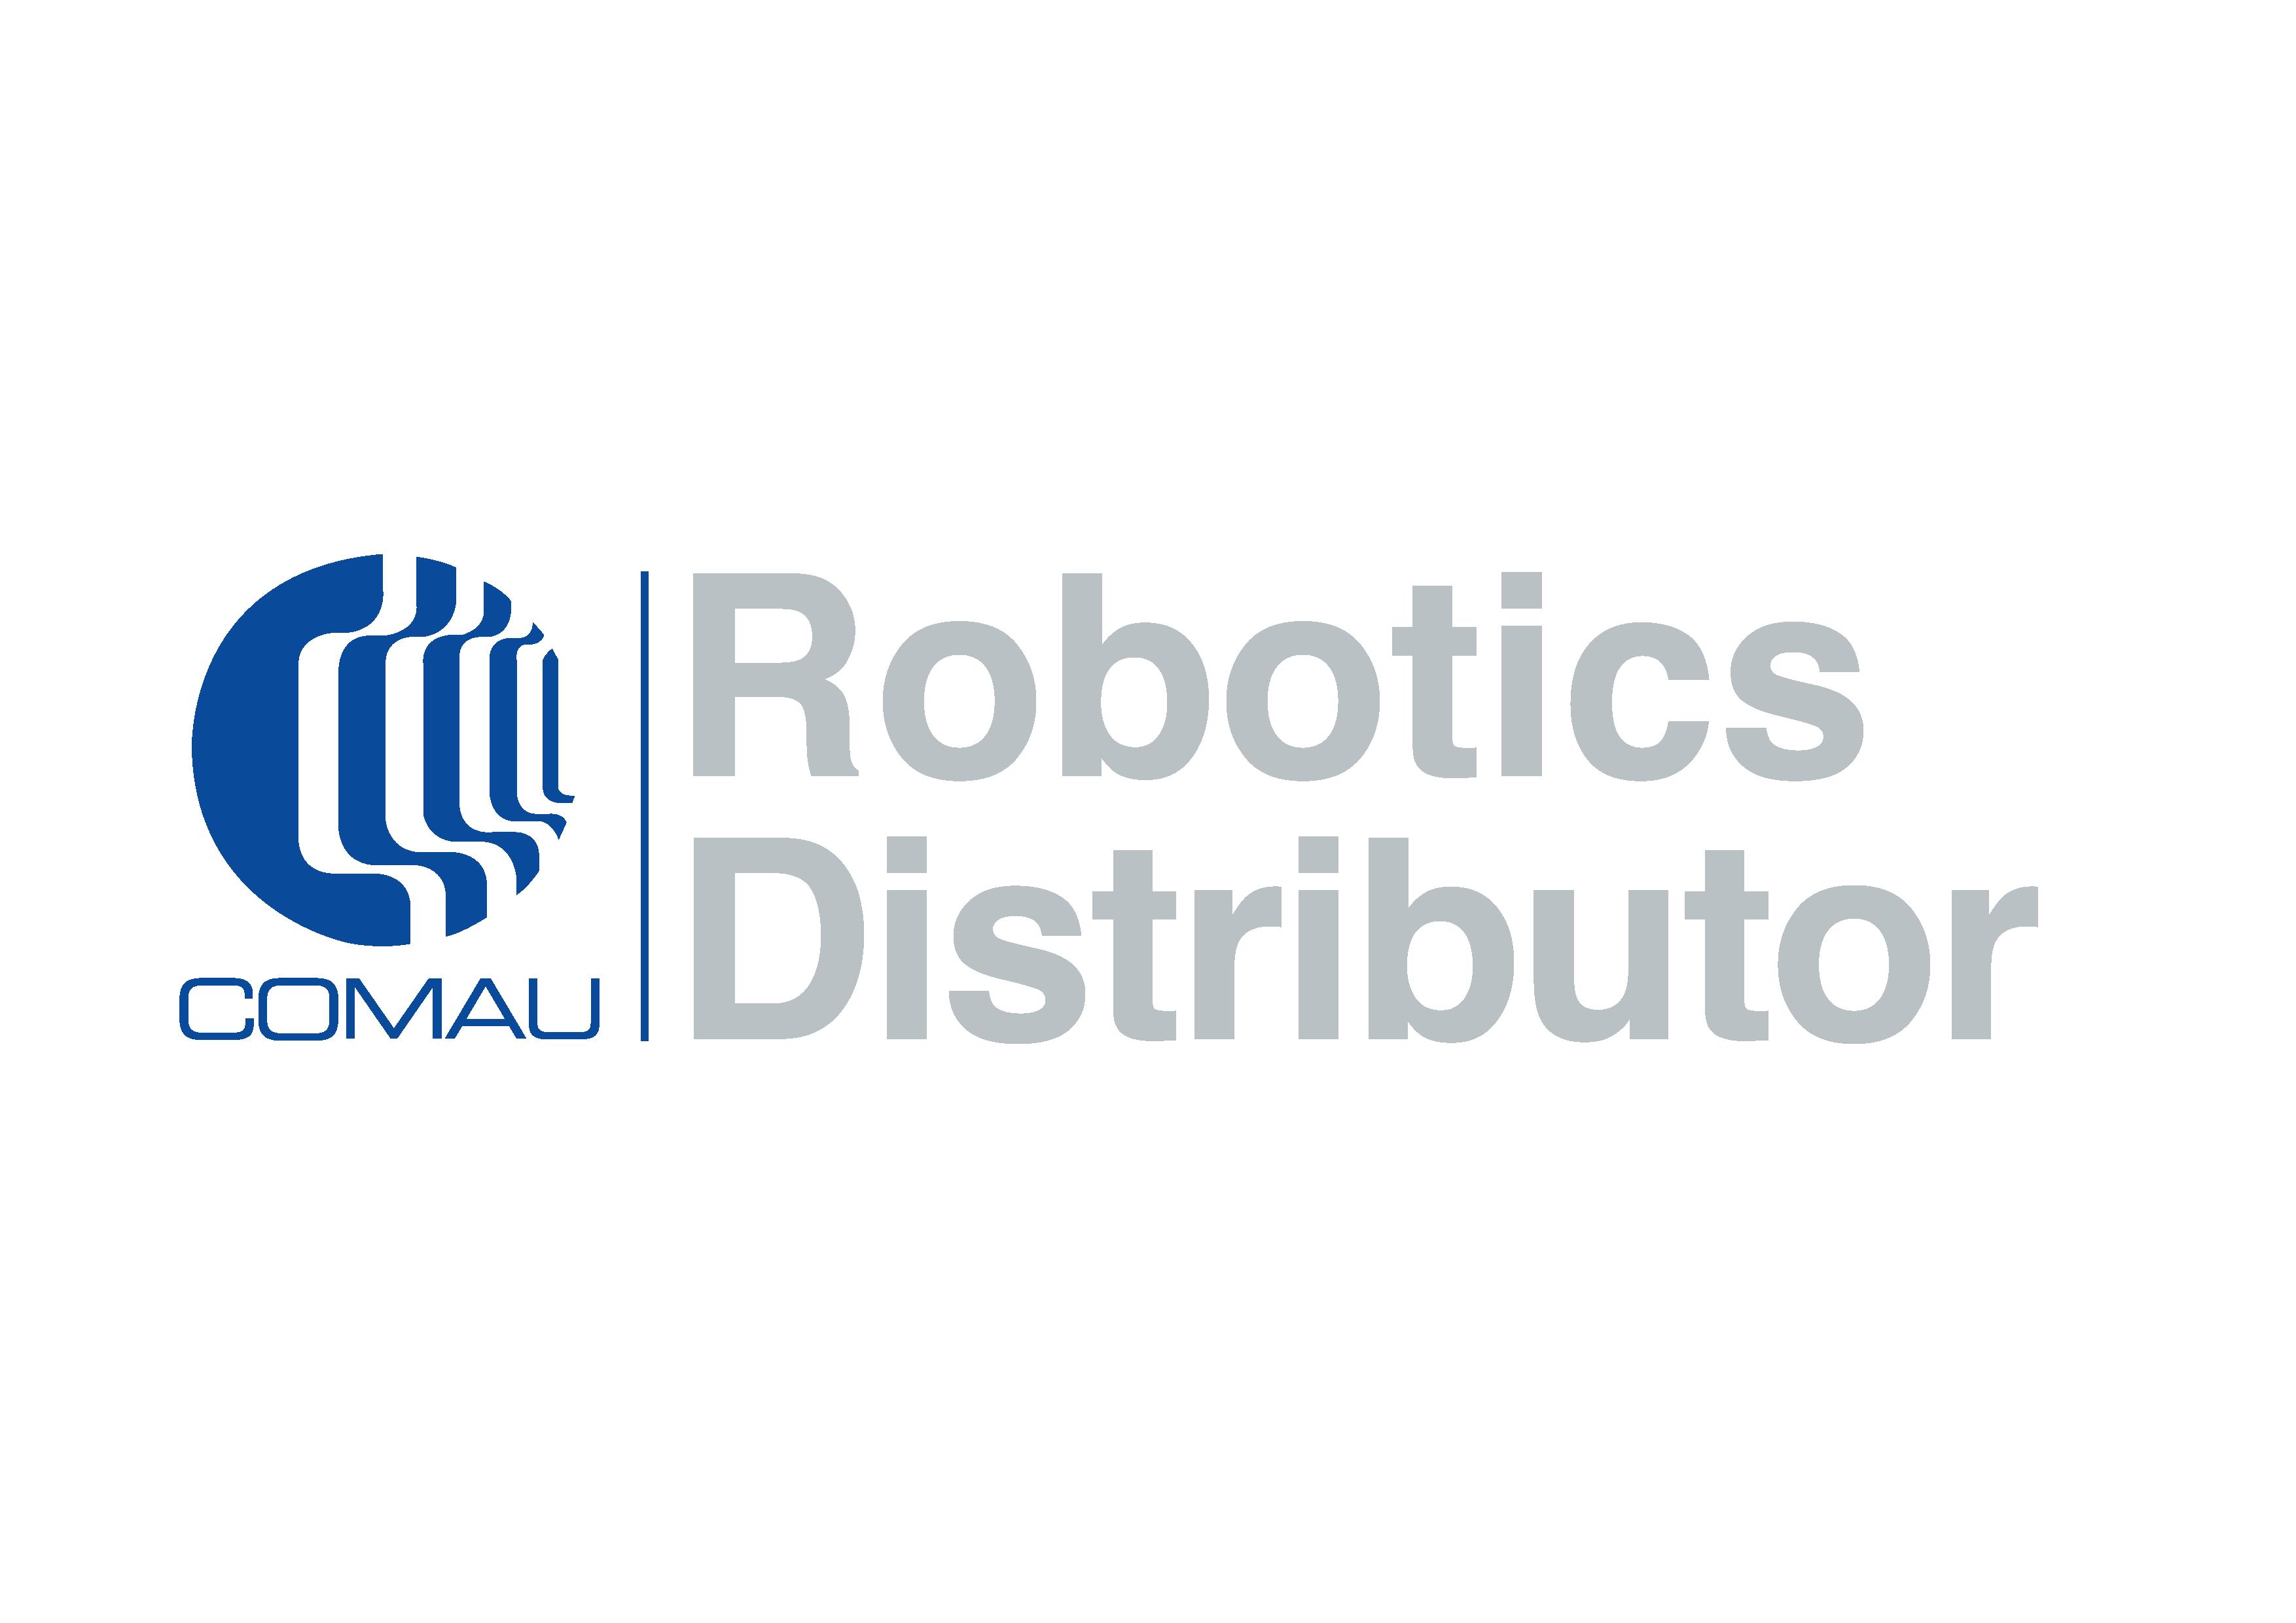 logo-robotics-distributor